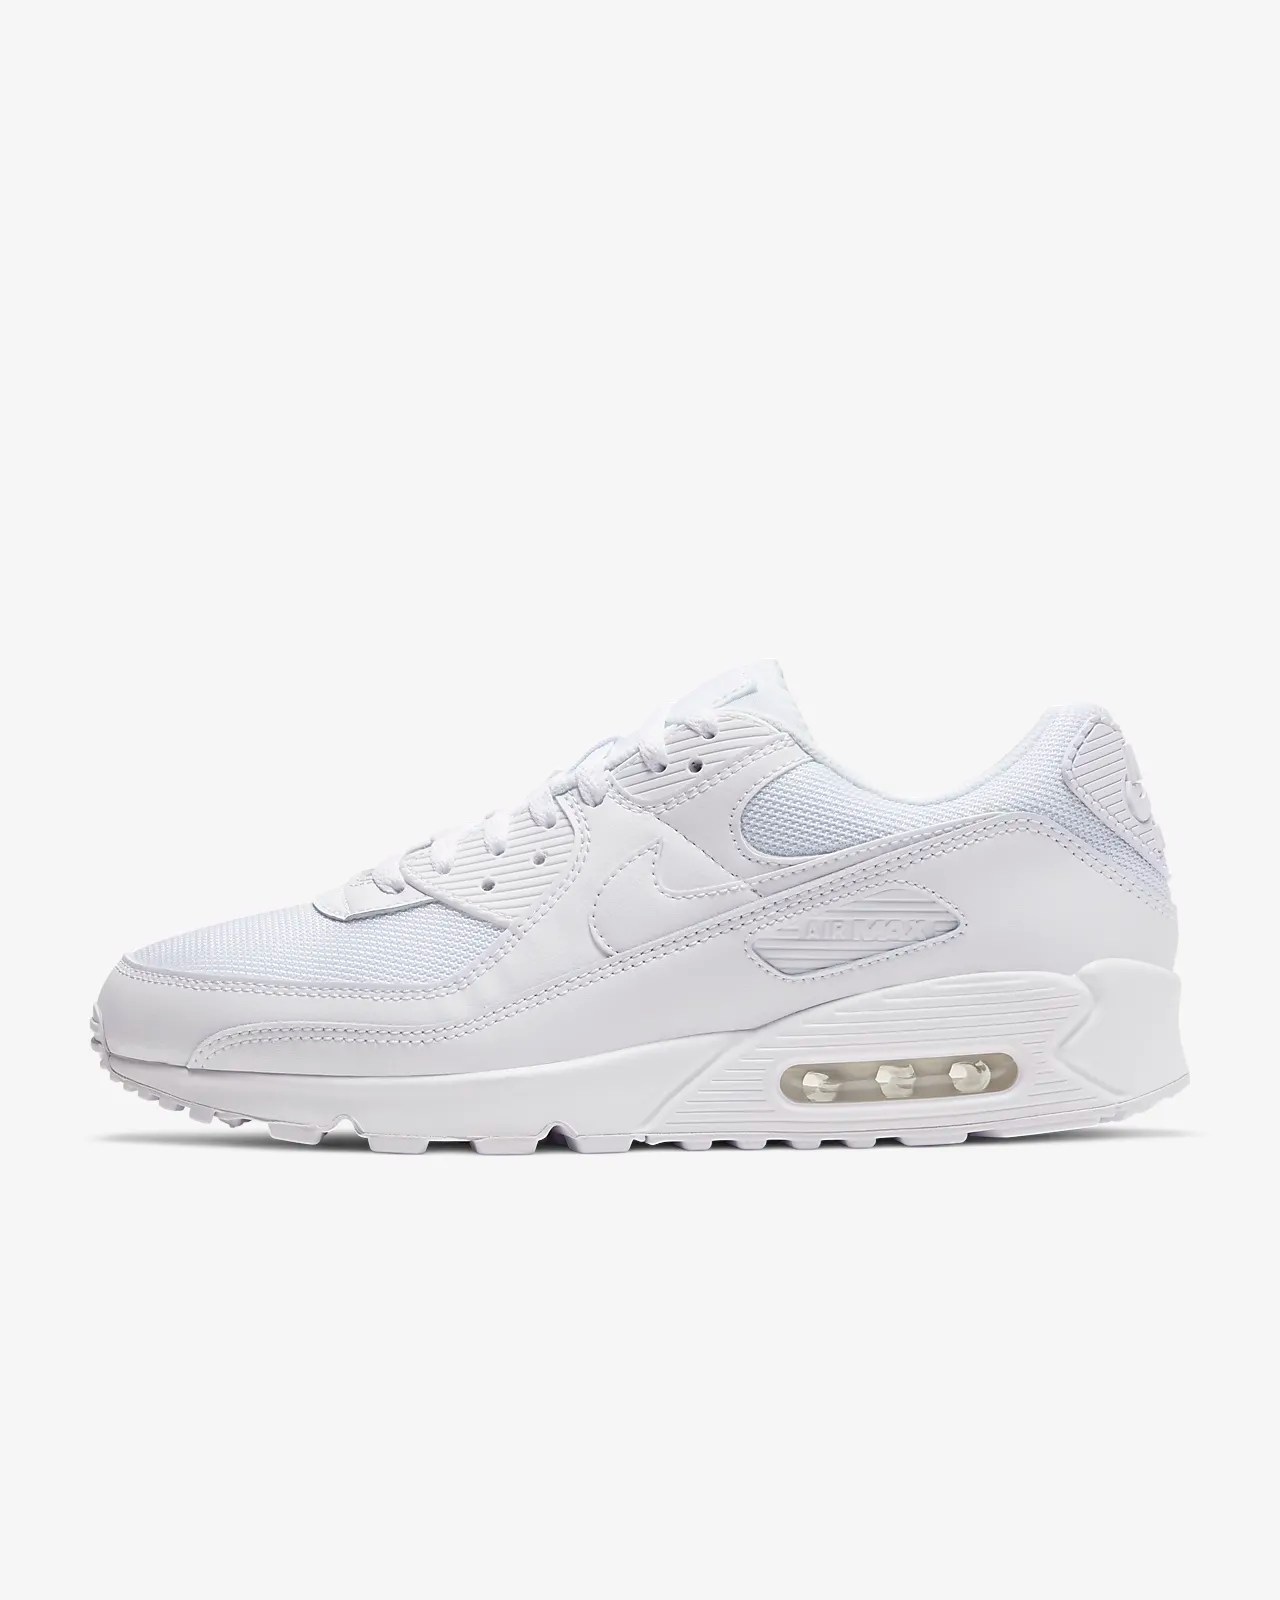 Nike Air Max 90 'Triple White' .00 Free Shipping